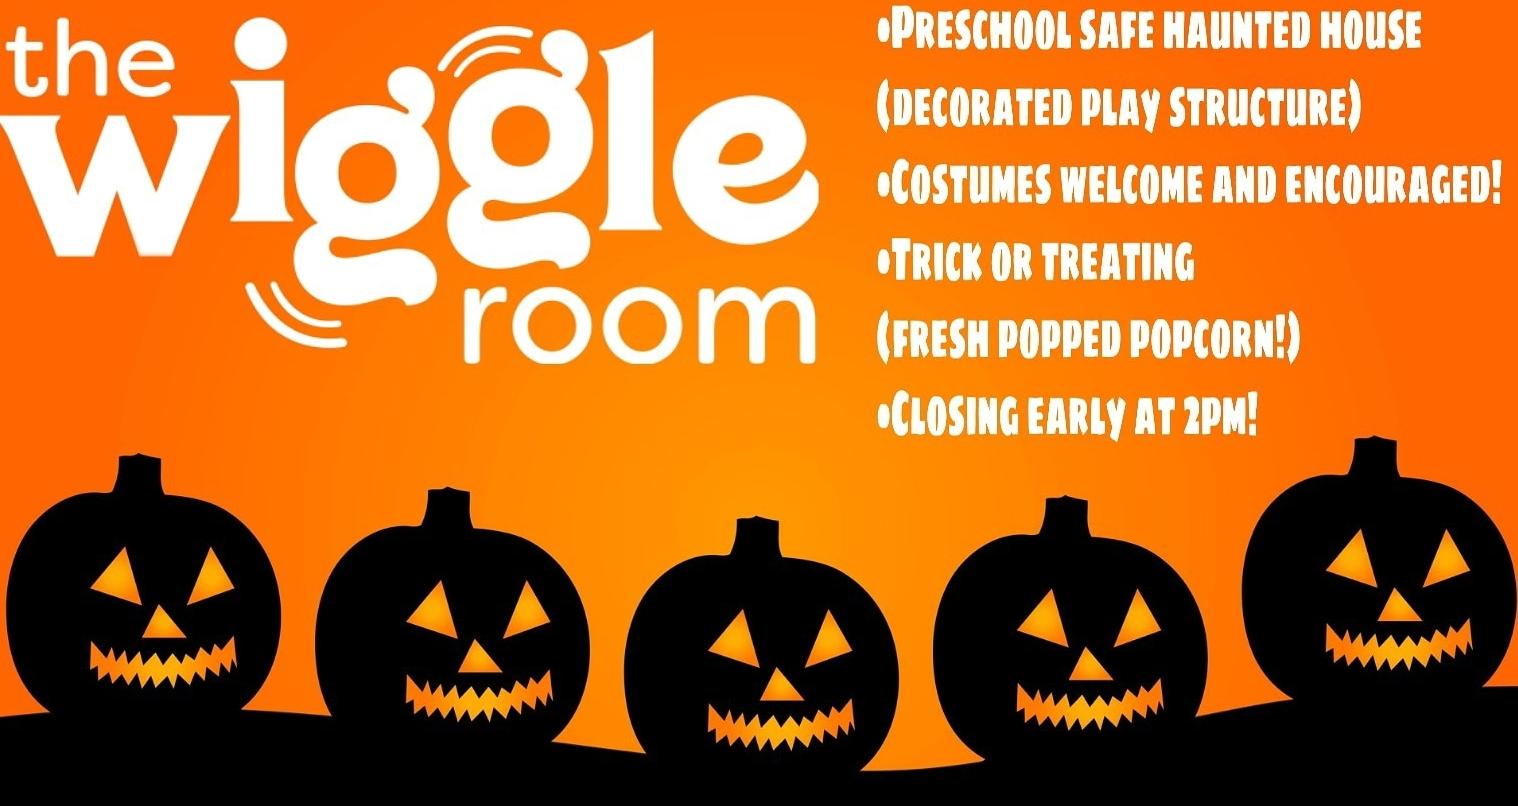 The Wiggle Room Halloween.jpg